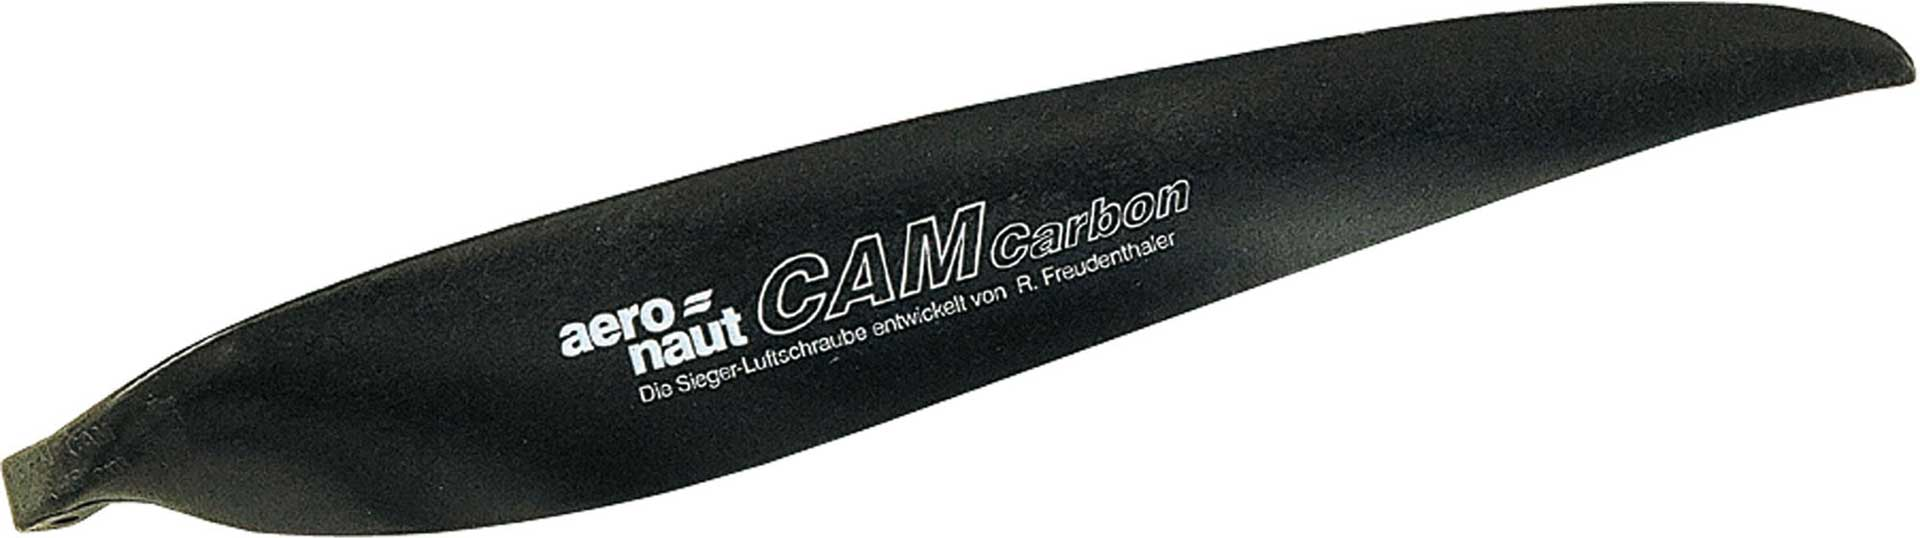 AERONAUT CAM-CARBON SPARE PROP BLADE 12/8